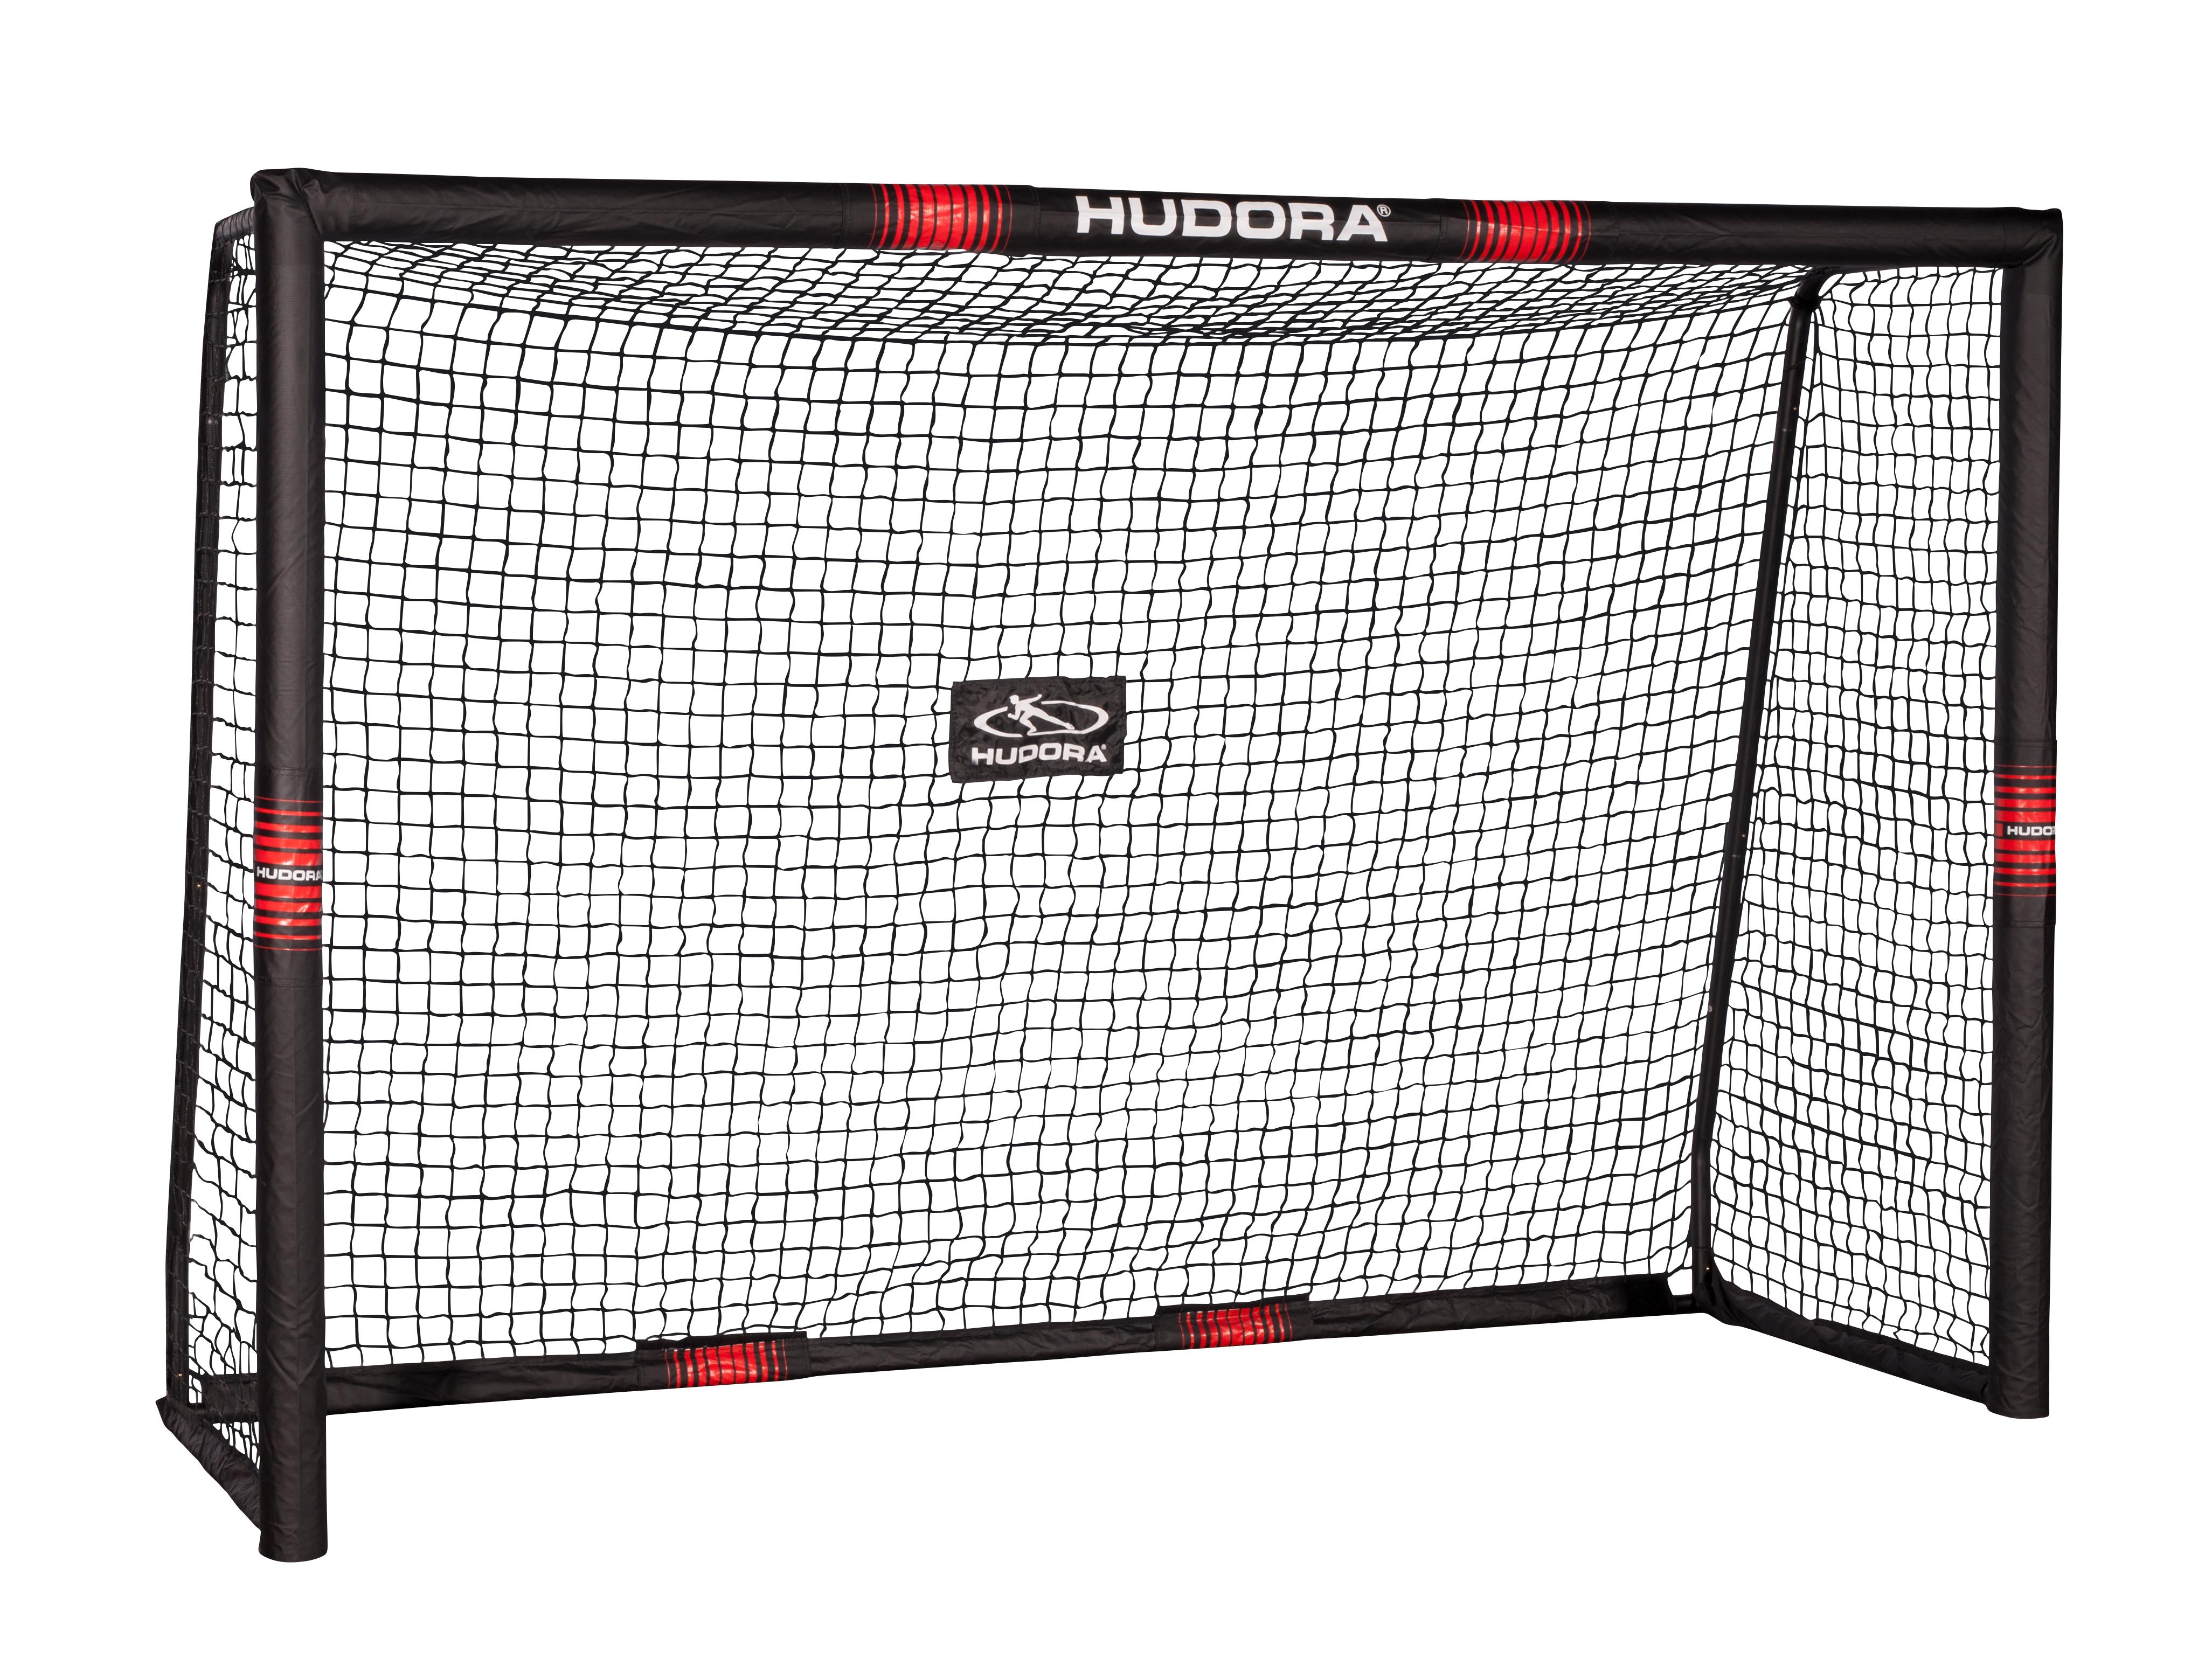 hudora 76914 fu balltor pro tect 240x160x85 ebay. Black Bedroom Furniture Sets. Home Design Ideas